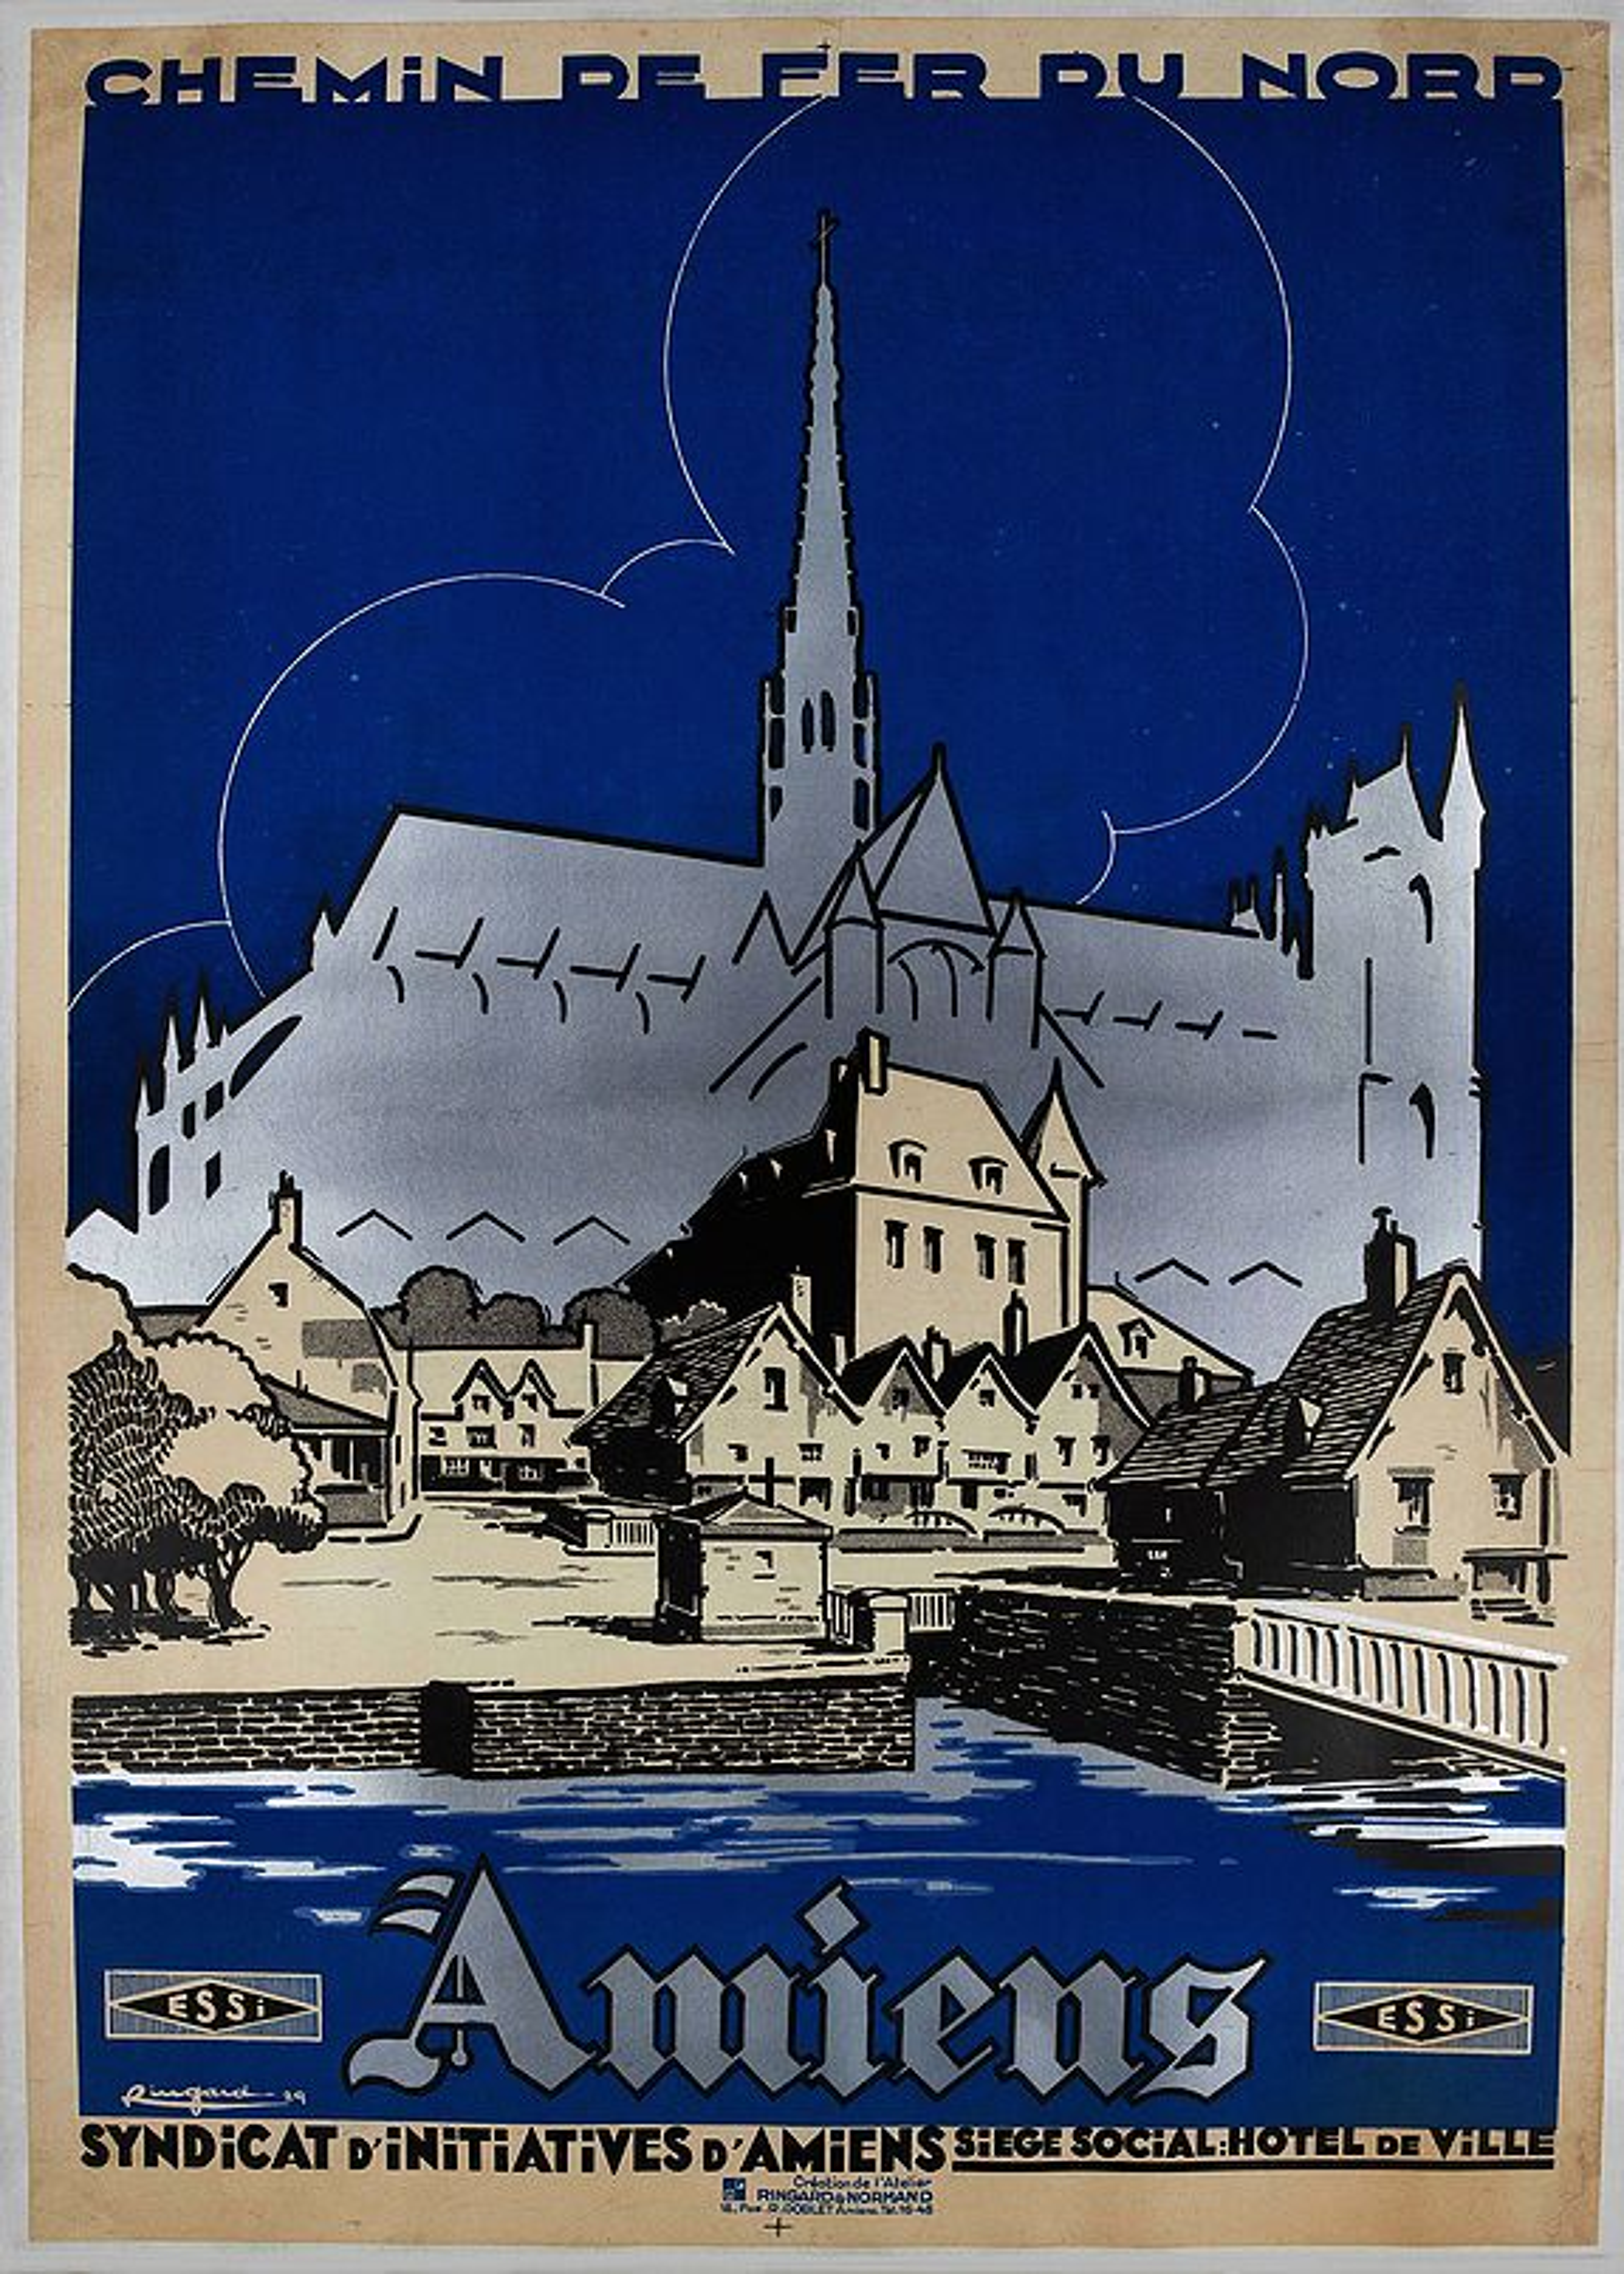 RINGARD & NORMAND -  Amiens.  Chemin de fer du nord.